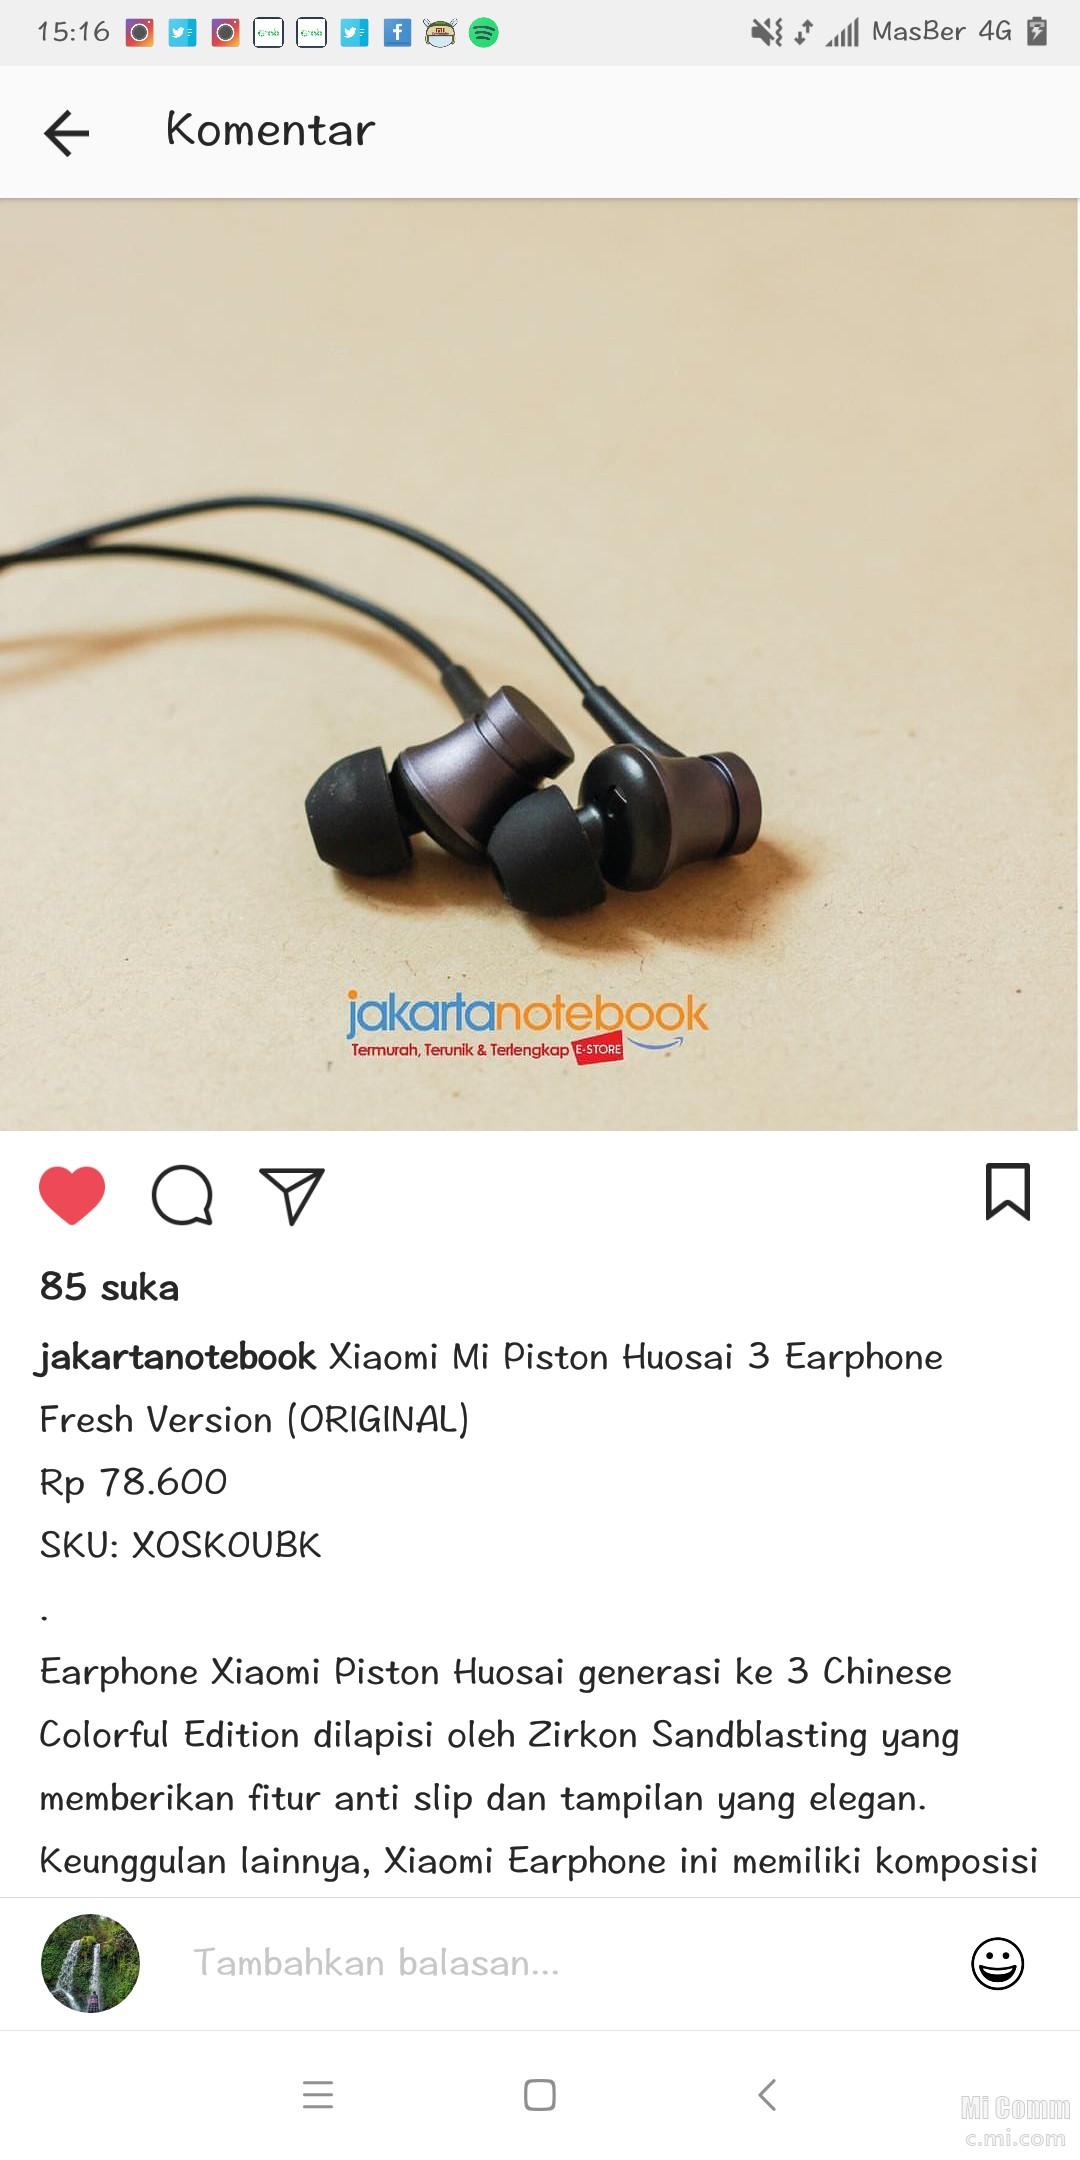 Headset Yang Bagus Apa Redmi Note 5 Mi Community Xiaomi Piston Huosai 2 Earphone Colorful Edition Original Click To Edit